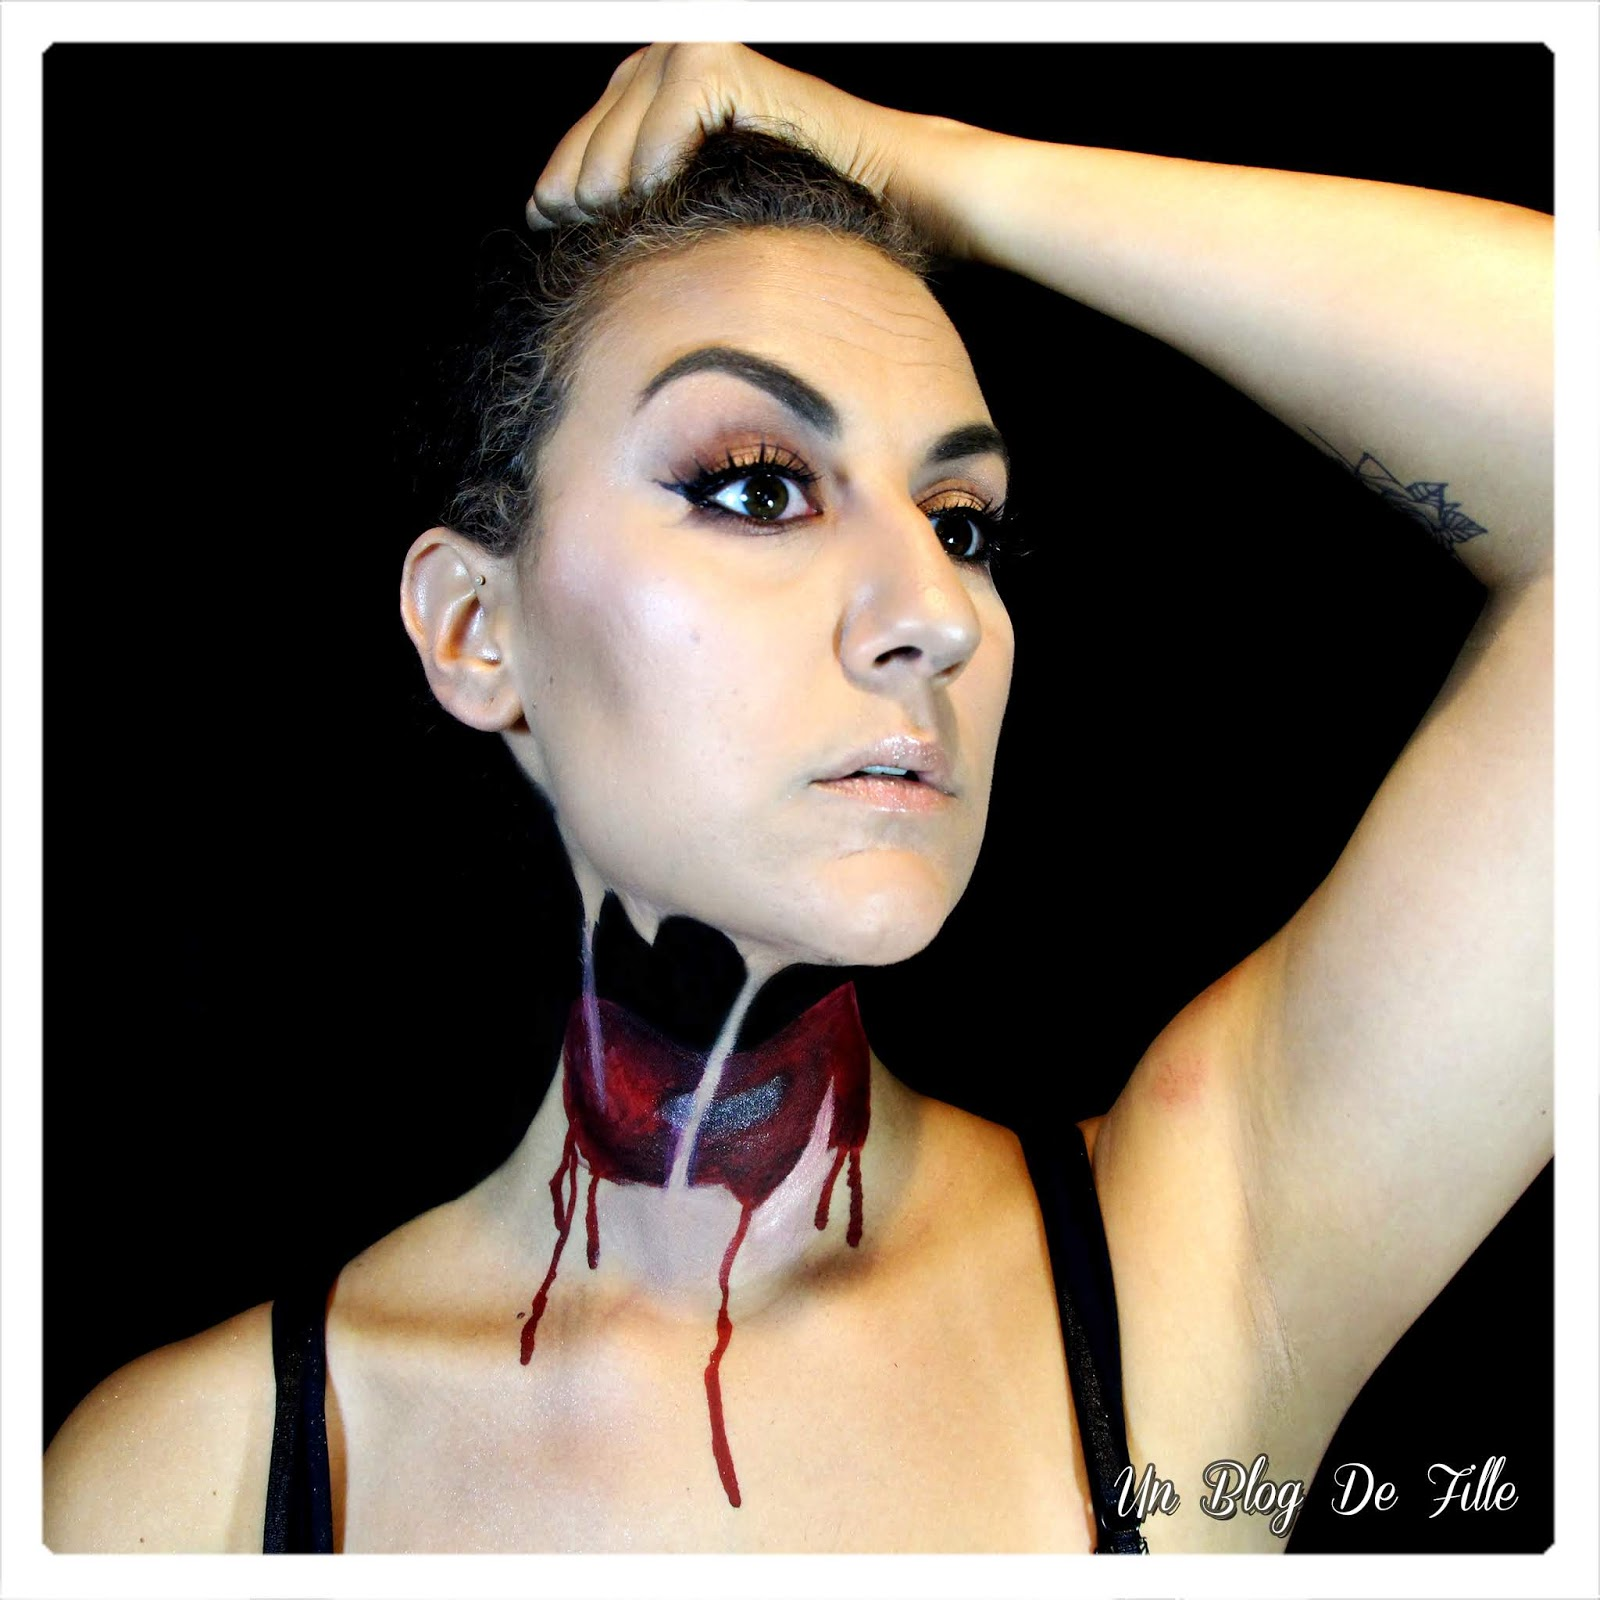 http://www.unblogdefille.fr/2018/06/maquillage-artistique-tete-decoupee-dark.html